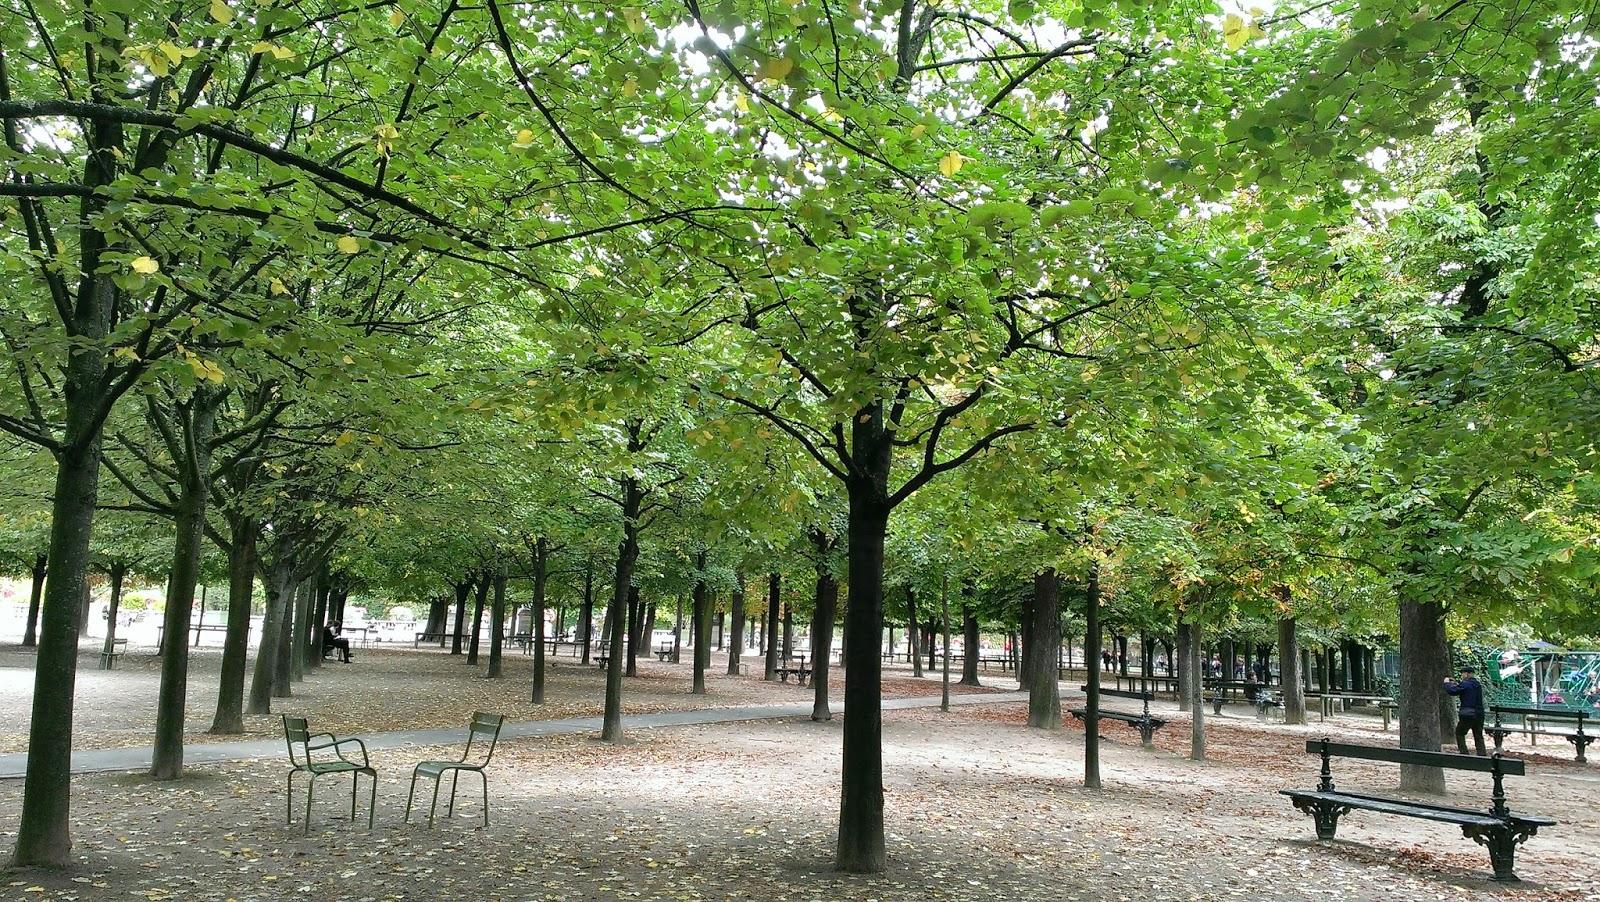 19 le jardin du luxembourg 100 for Le jardin 19